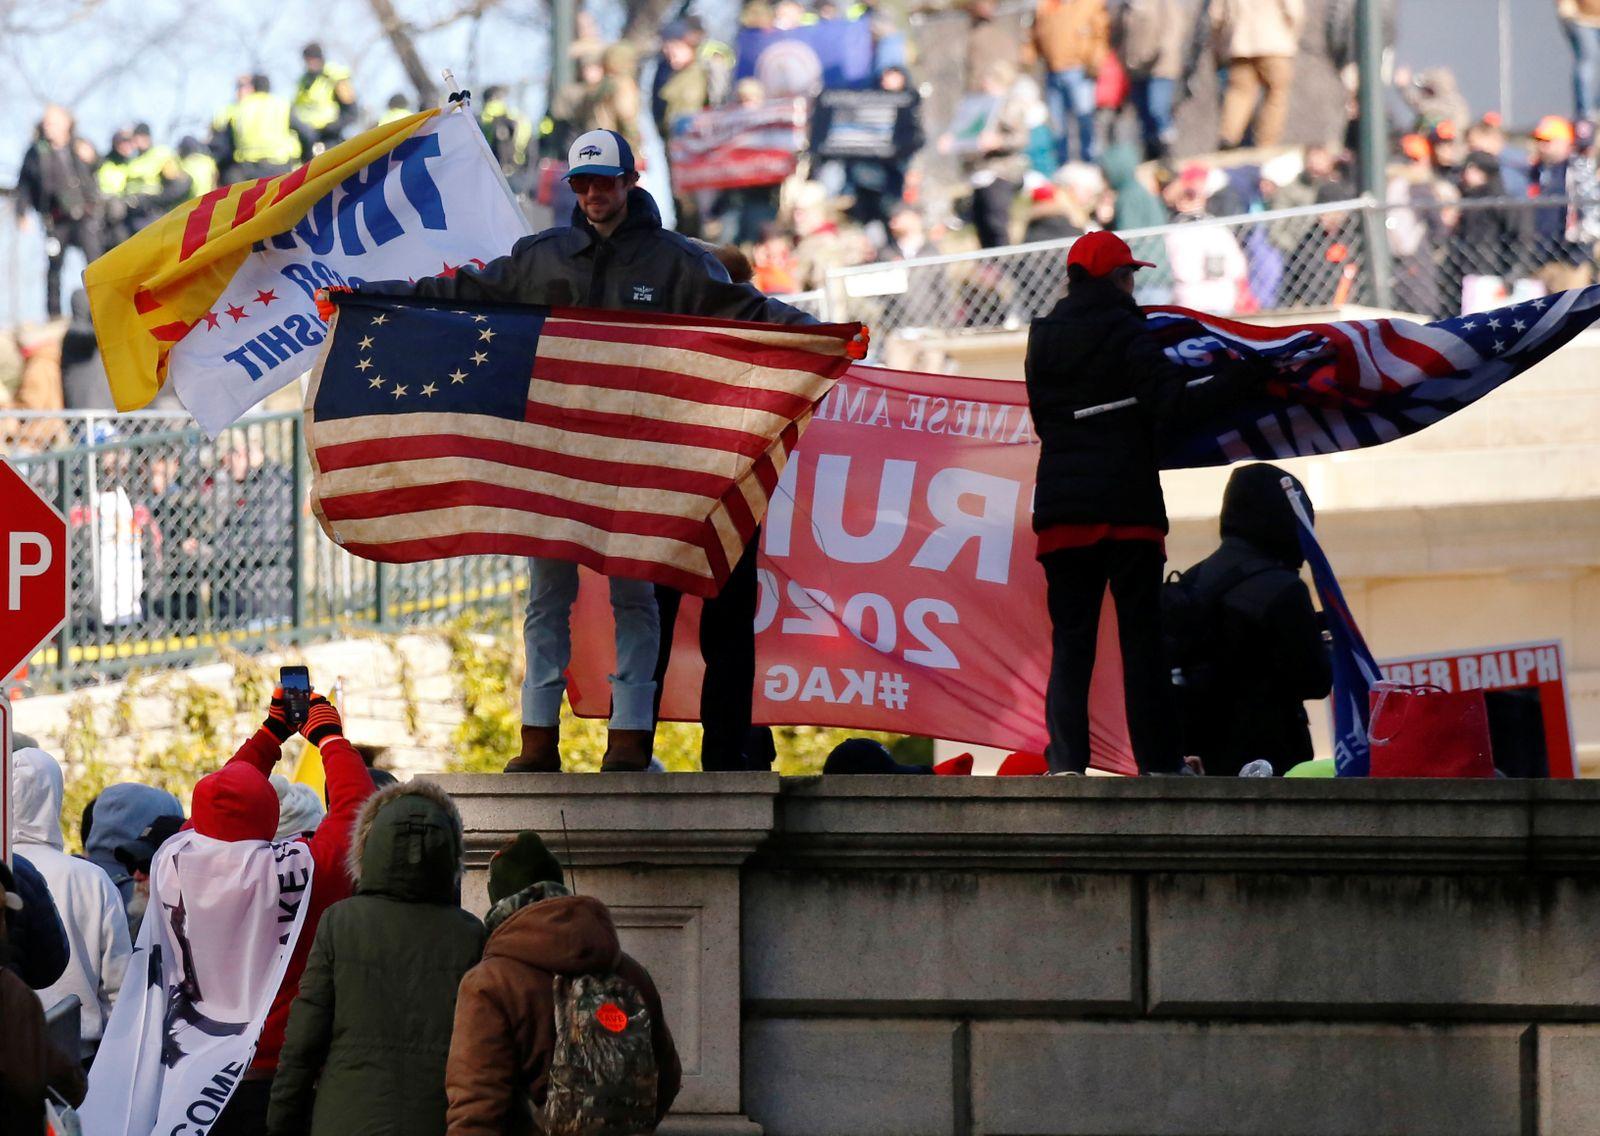 Gun rights advocates and militia members attend rally in Richmond, Virginia